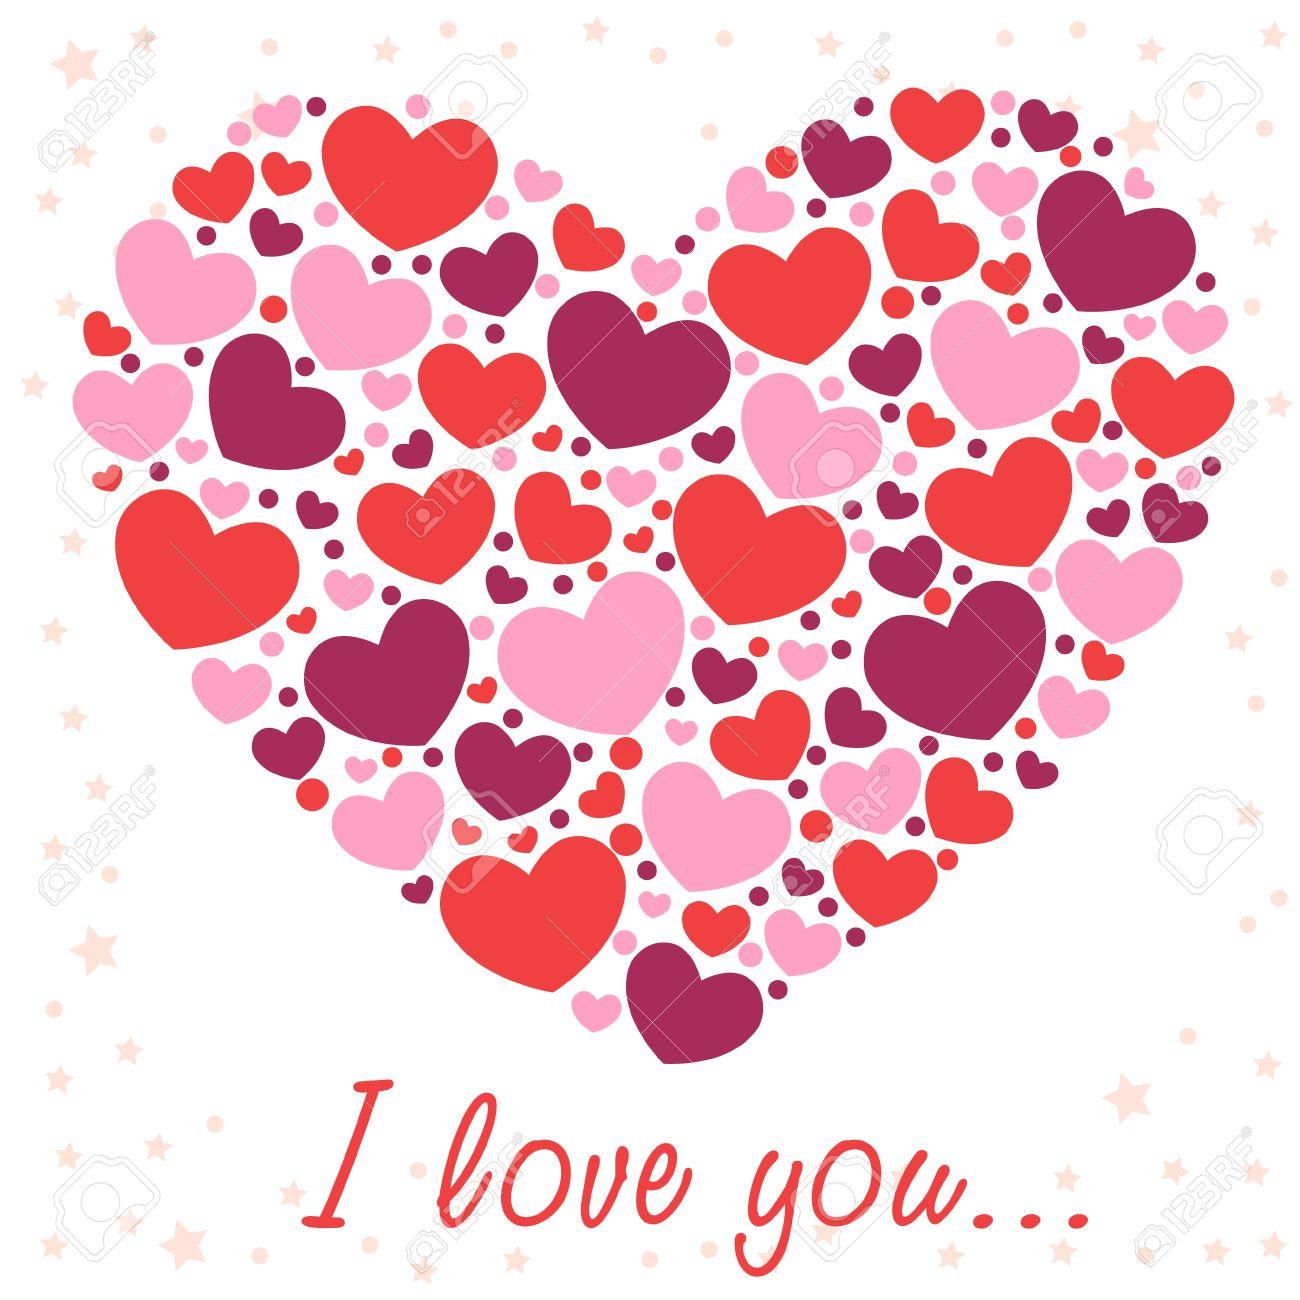 Cute Valentine love congratulation card with border of hearts Stock Vector - 11941494